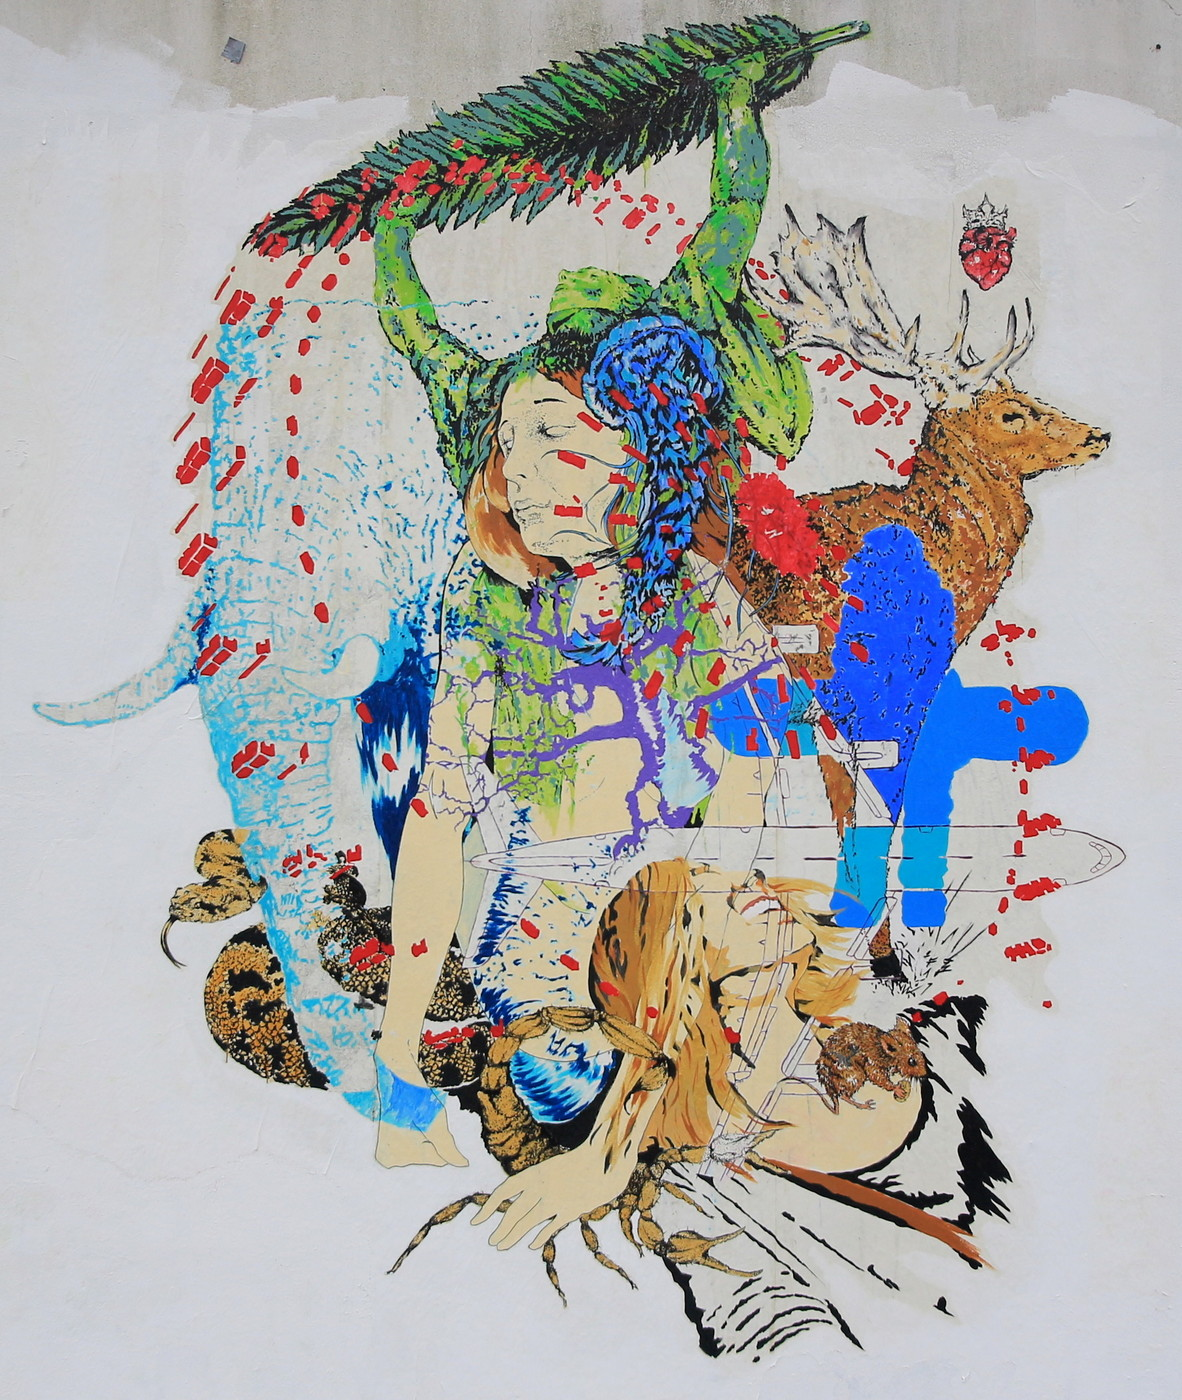 buenos aires murales paul mericle ba street art buenosairesstreetart.com